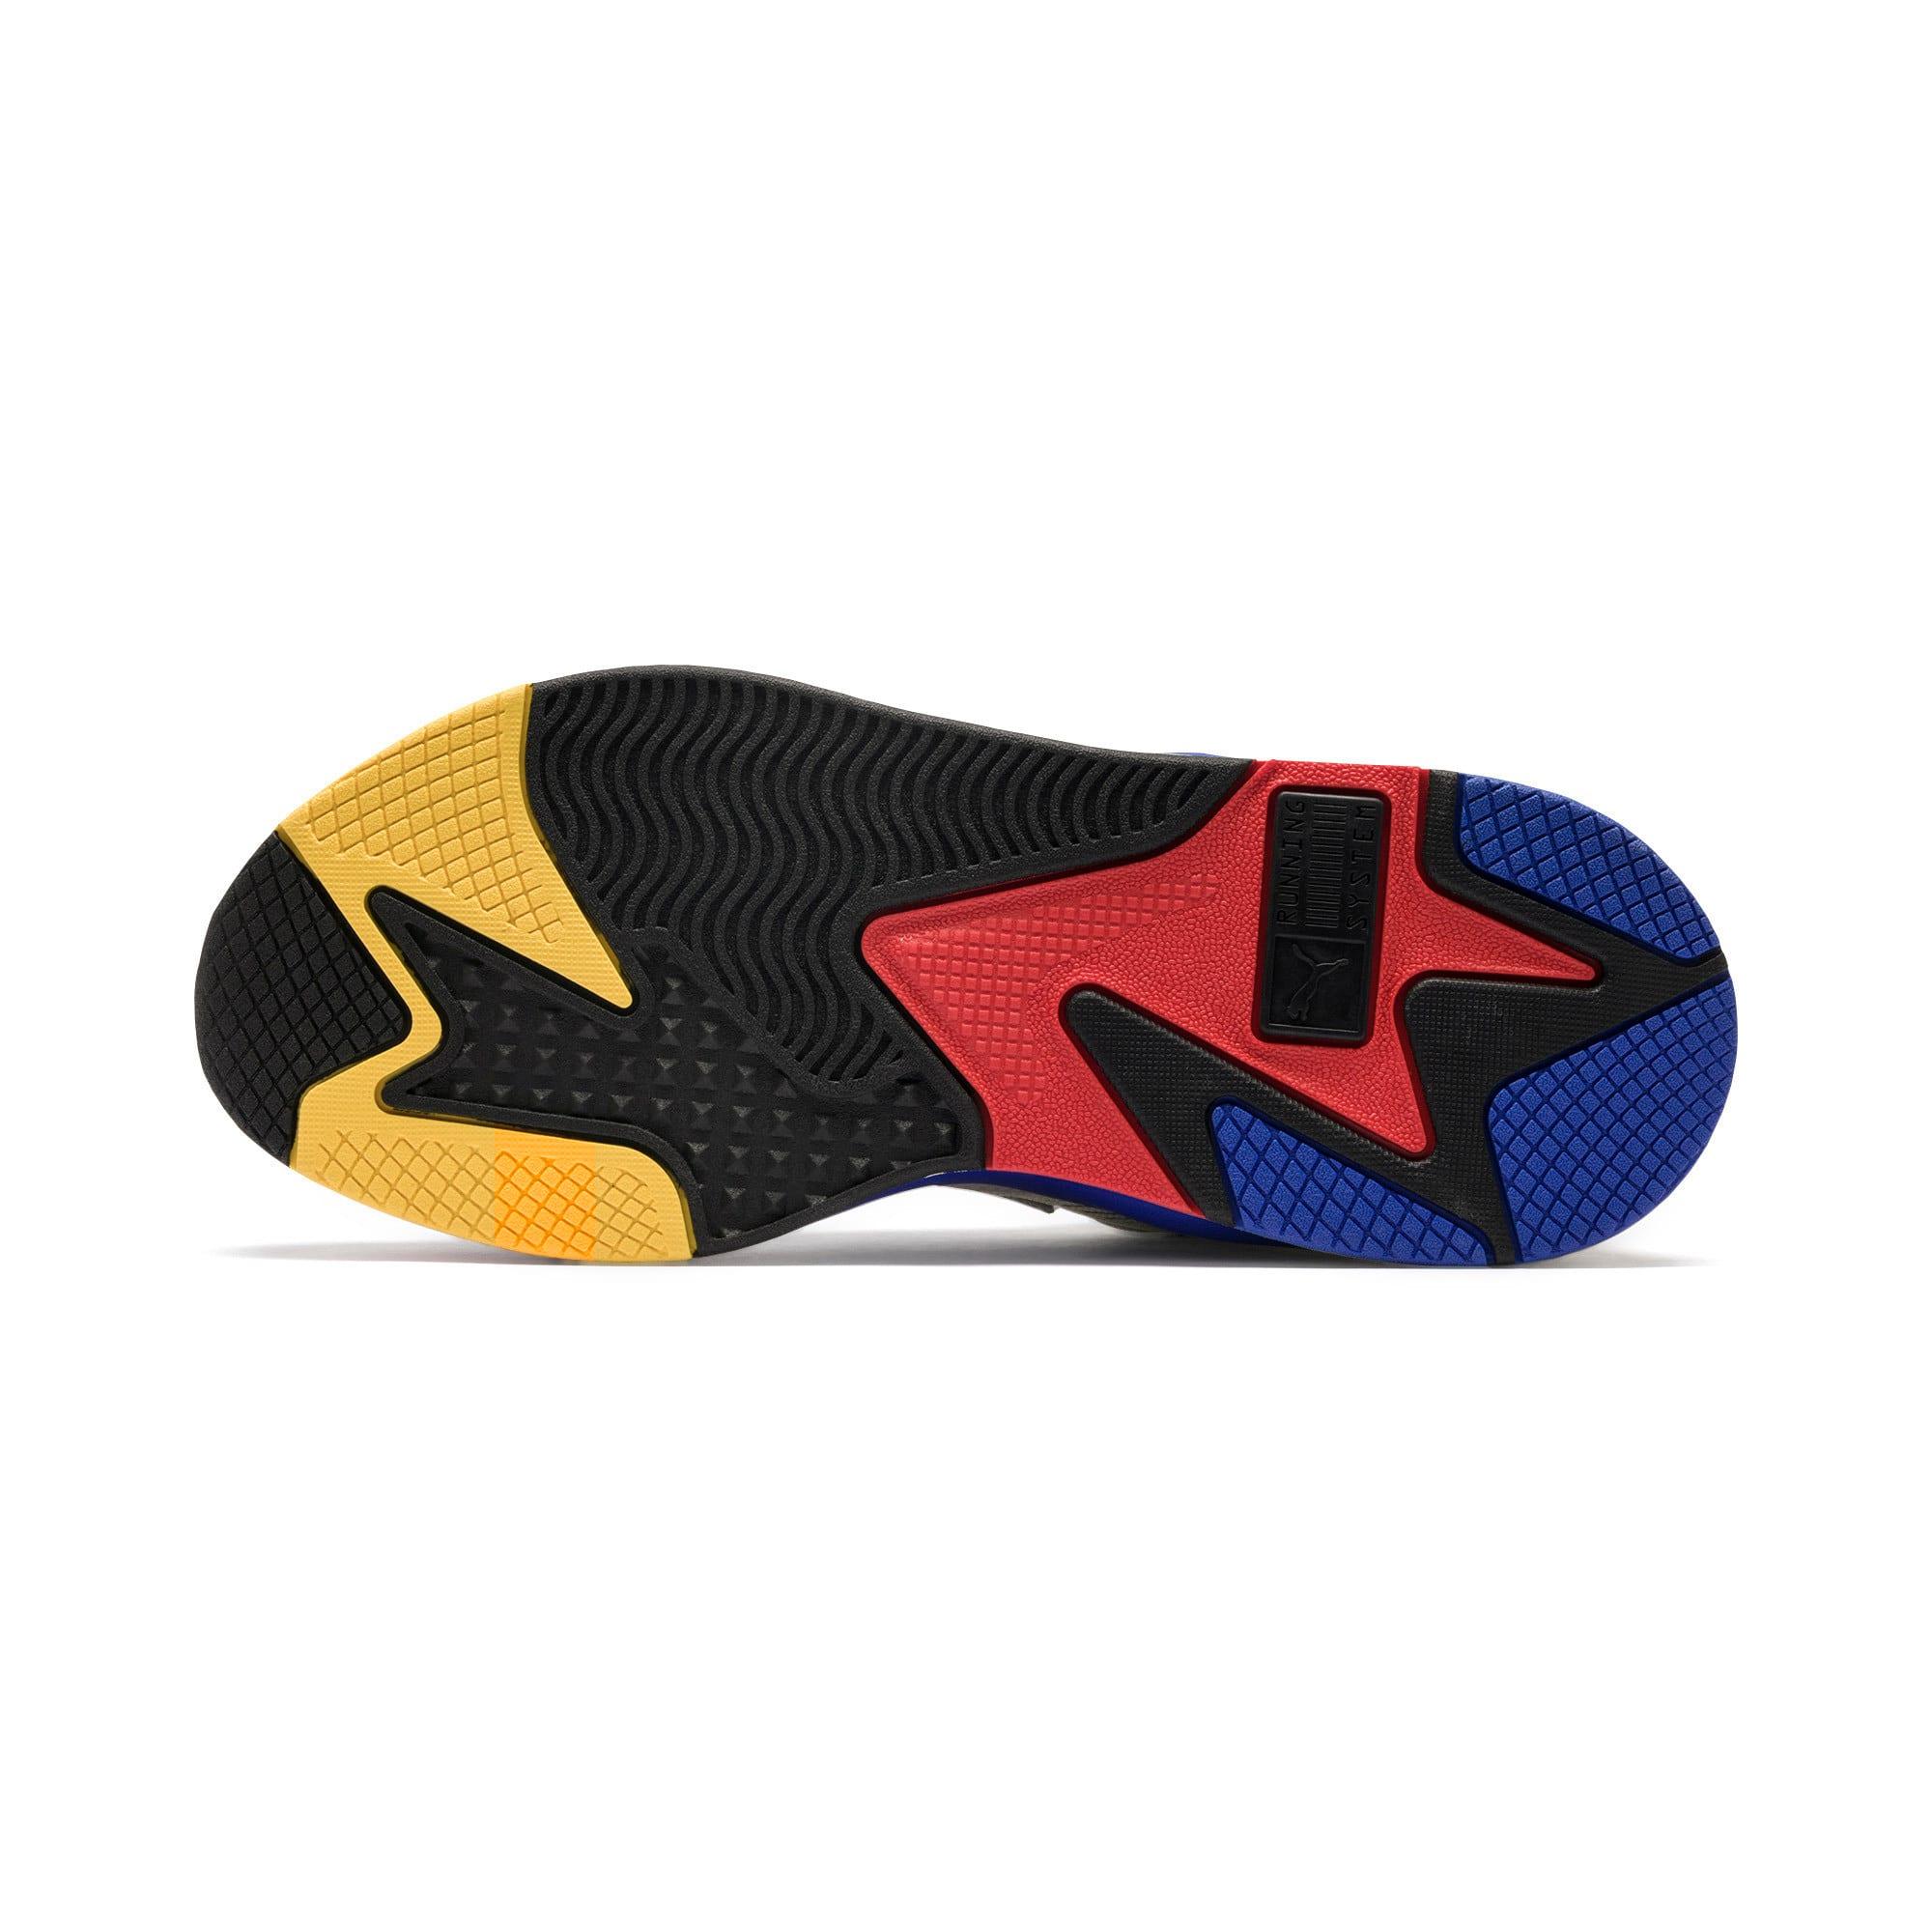 Thumbnail 5 of RS-X Colour Theory Sneaker, Whisper White-Puma Black, medium